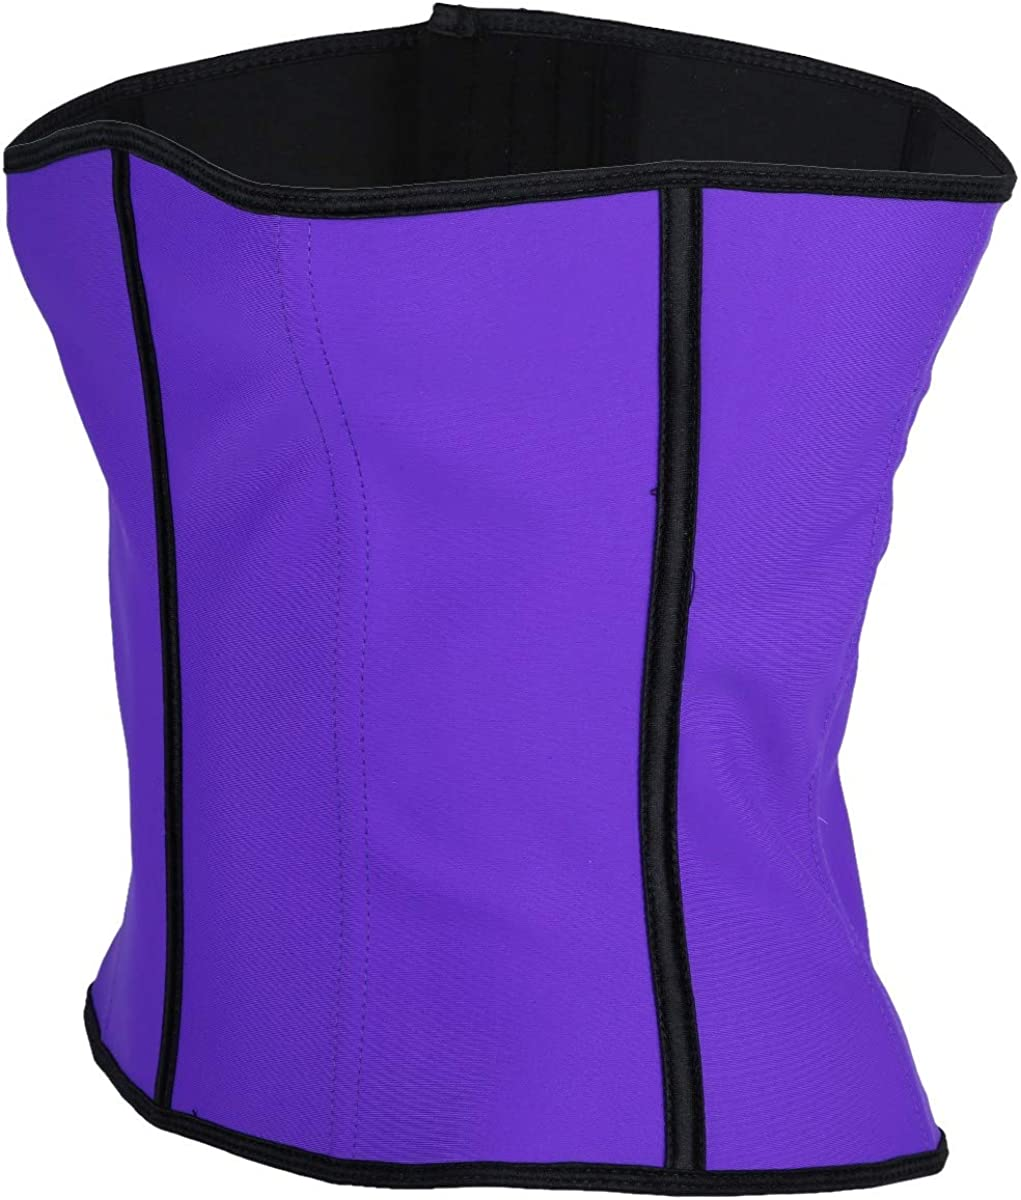 Sportmusies Women/'s Waist Trainer Corset for Weight Loss Tummy Control Sport Workout Body Shaper Cincher Shapewear